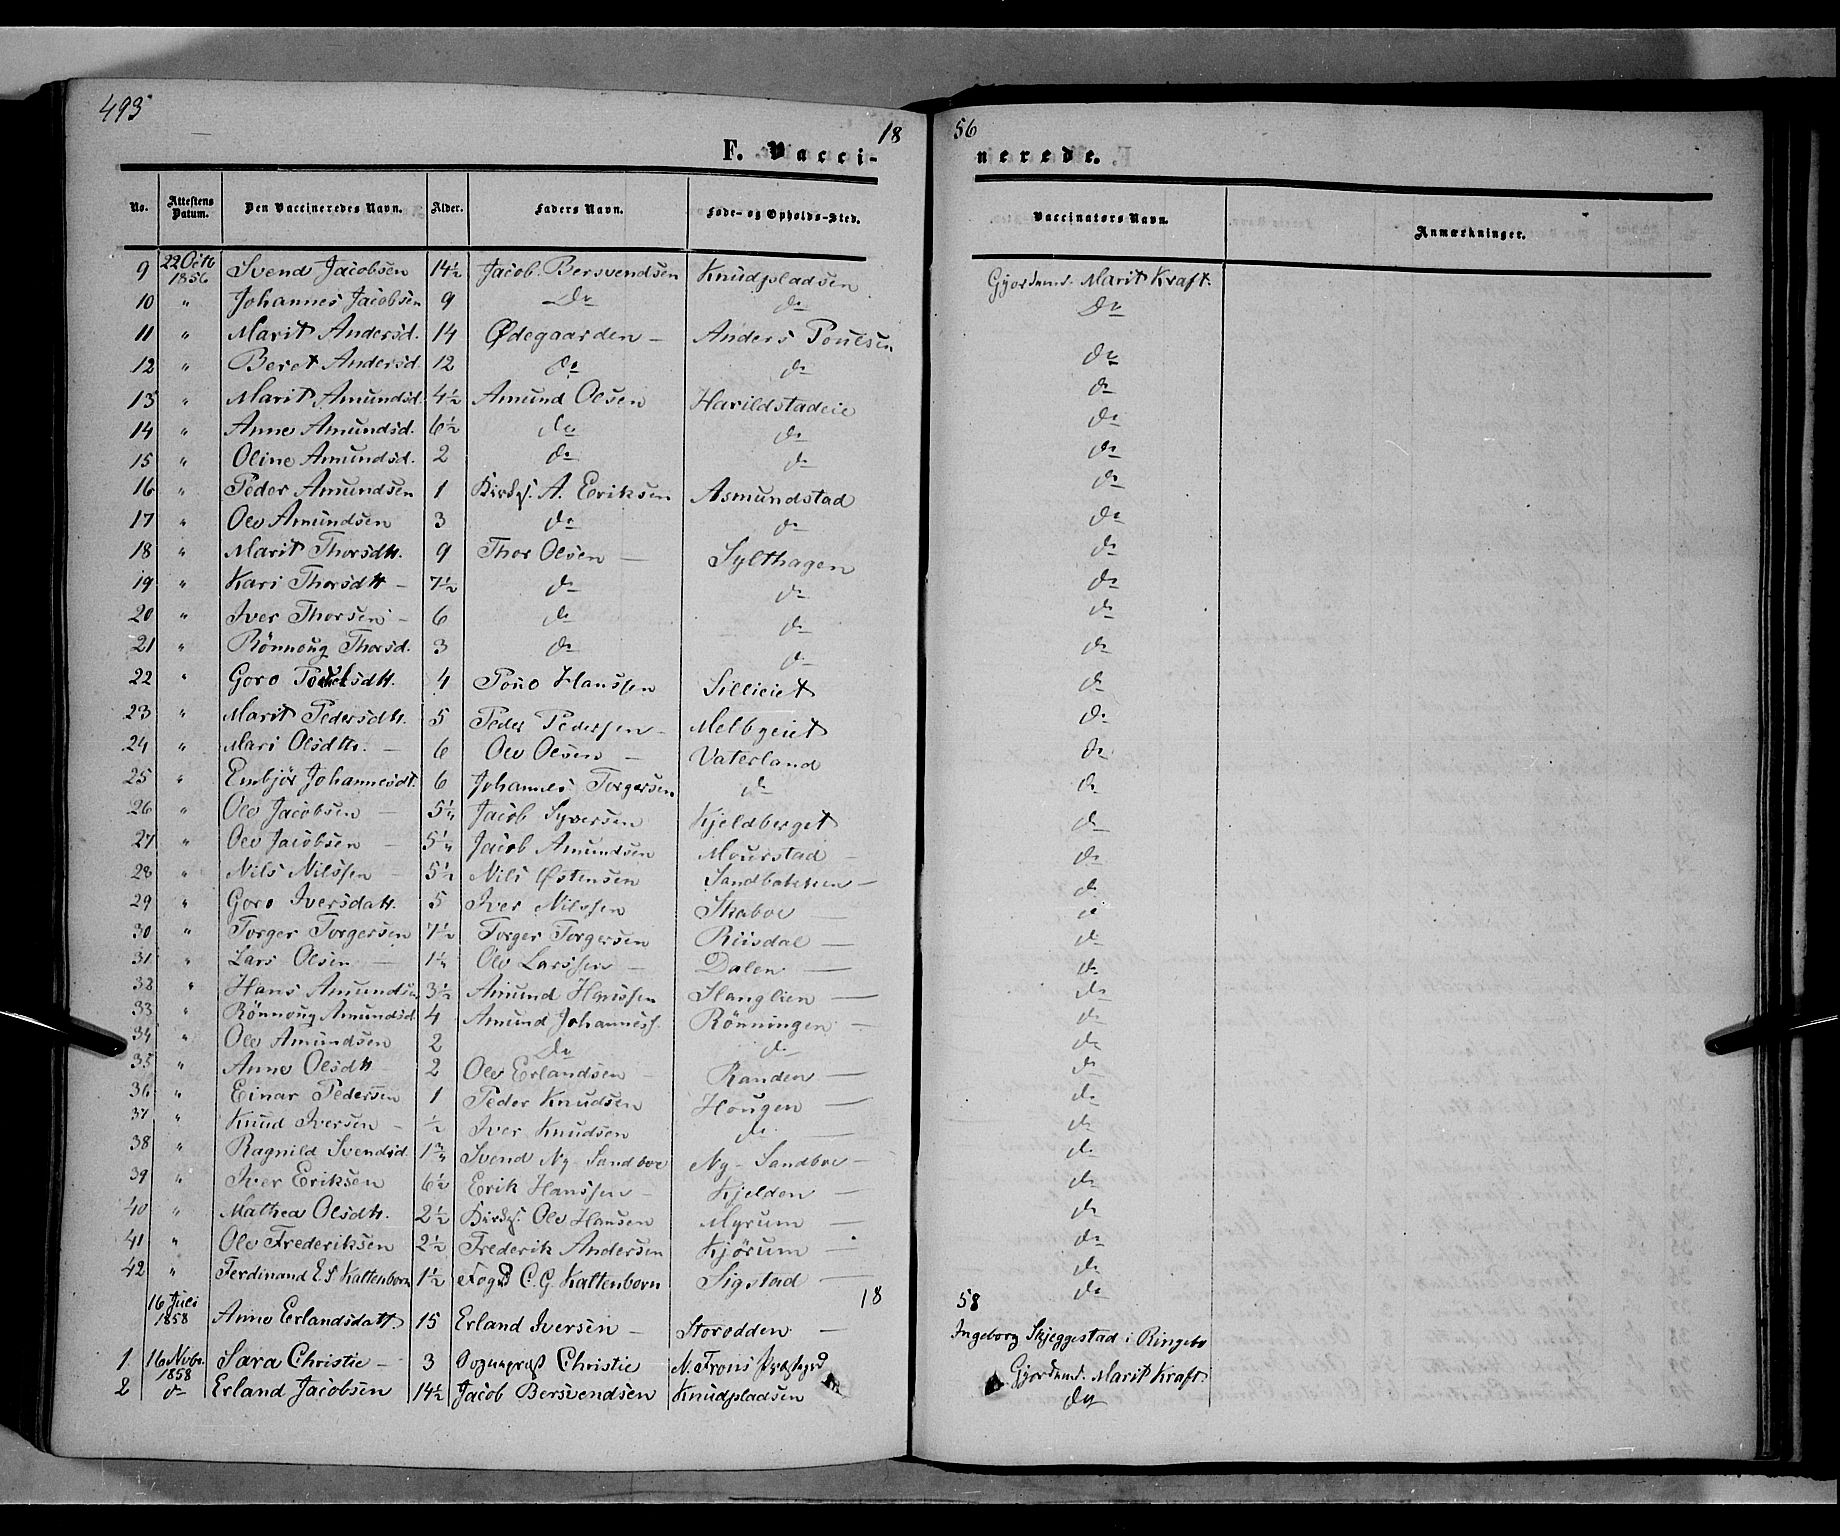 SAH, Nord-Fron prestekontor, Ministerialbok nr. 1, 1851-1864, s. 493